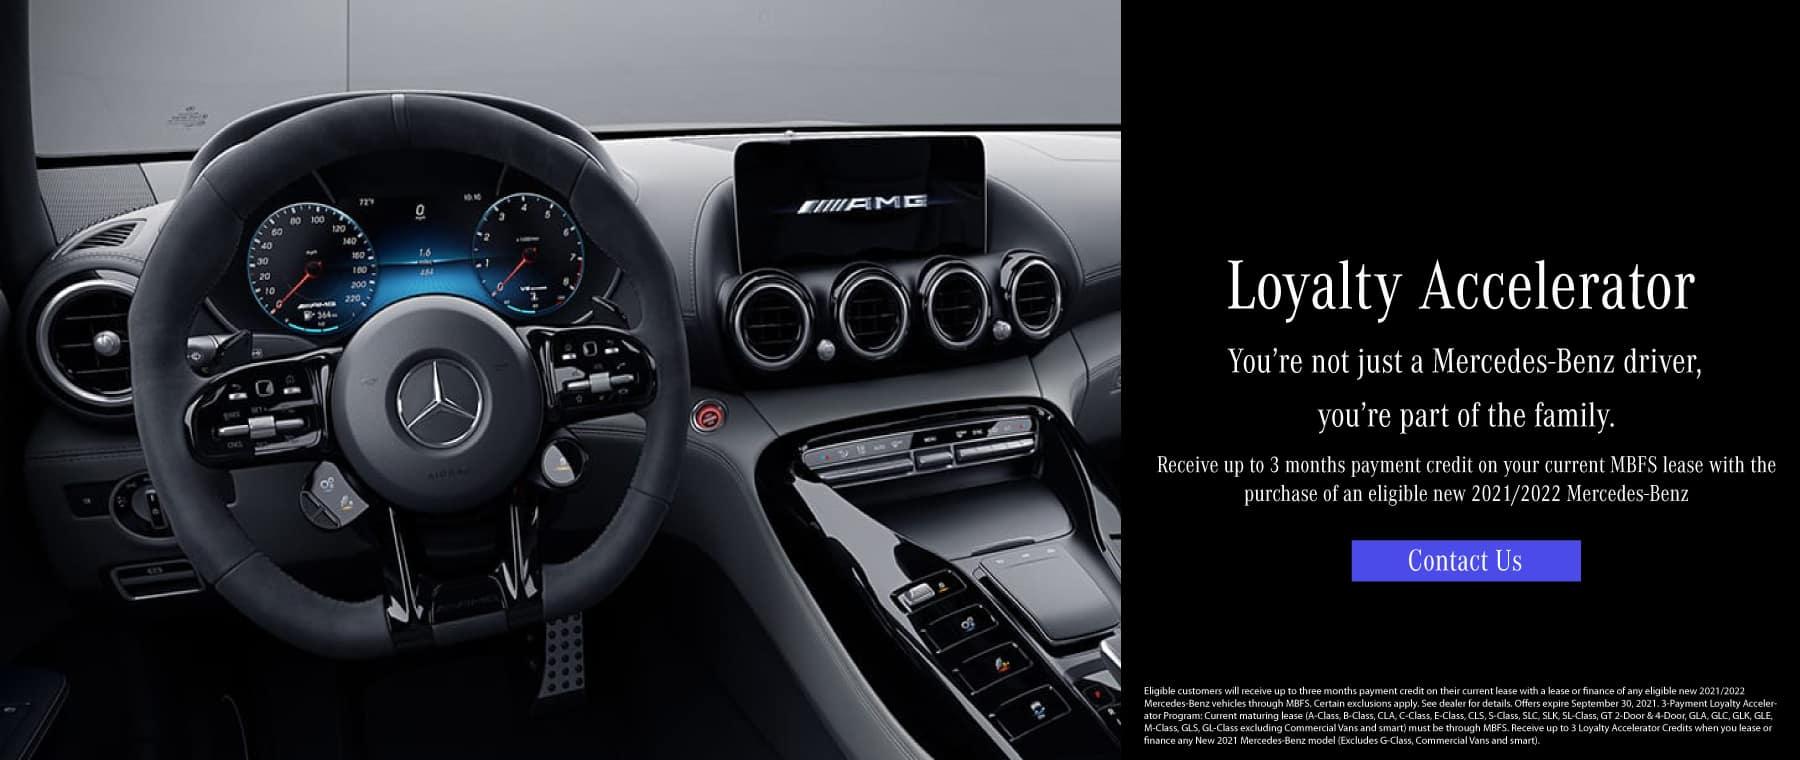 Mercedes-Benz of Beaverton Loyalty Accelerator new mercedes car specials